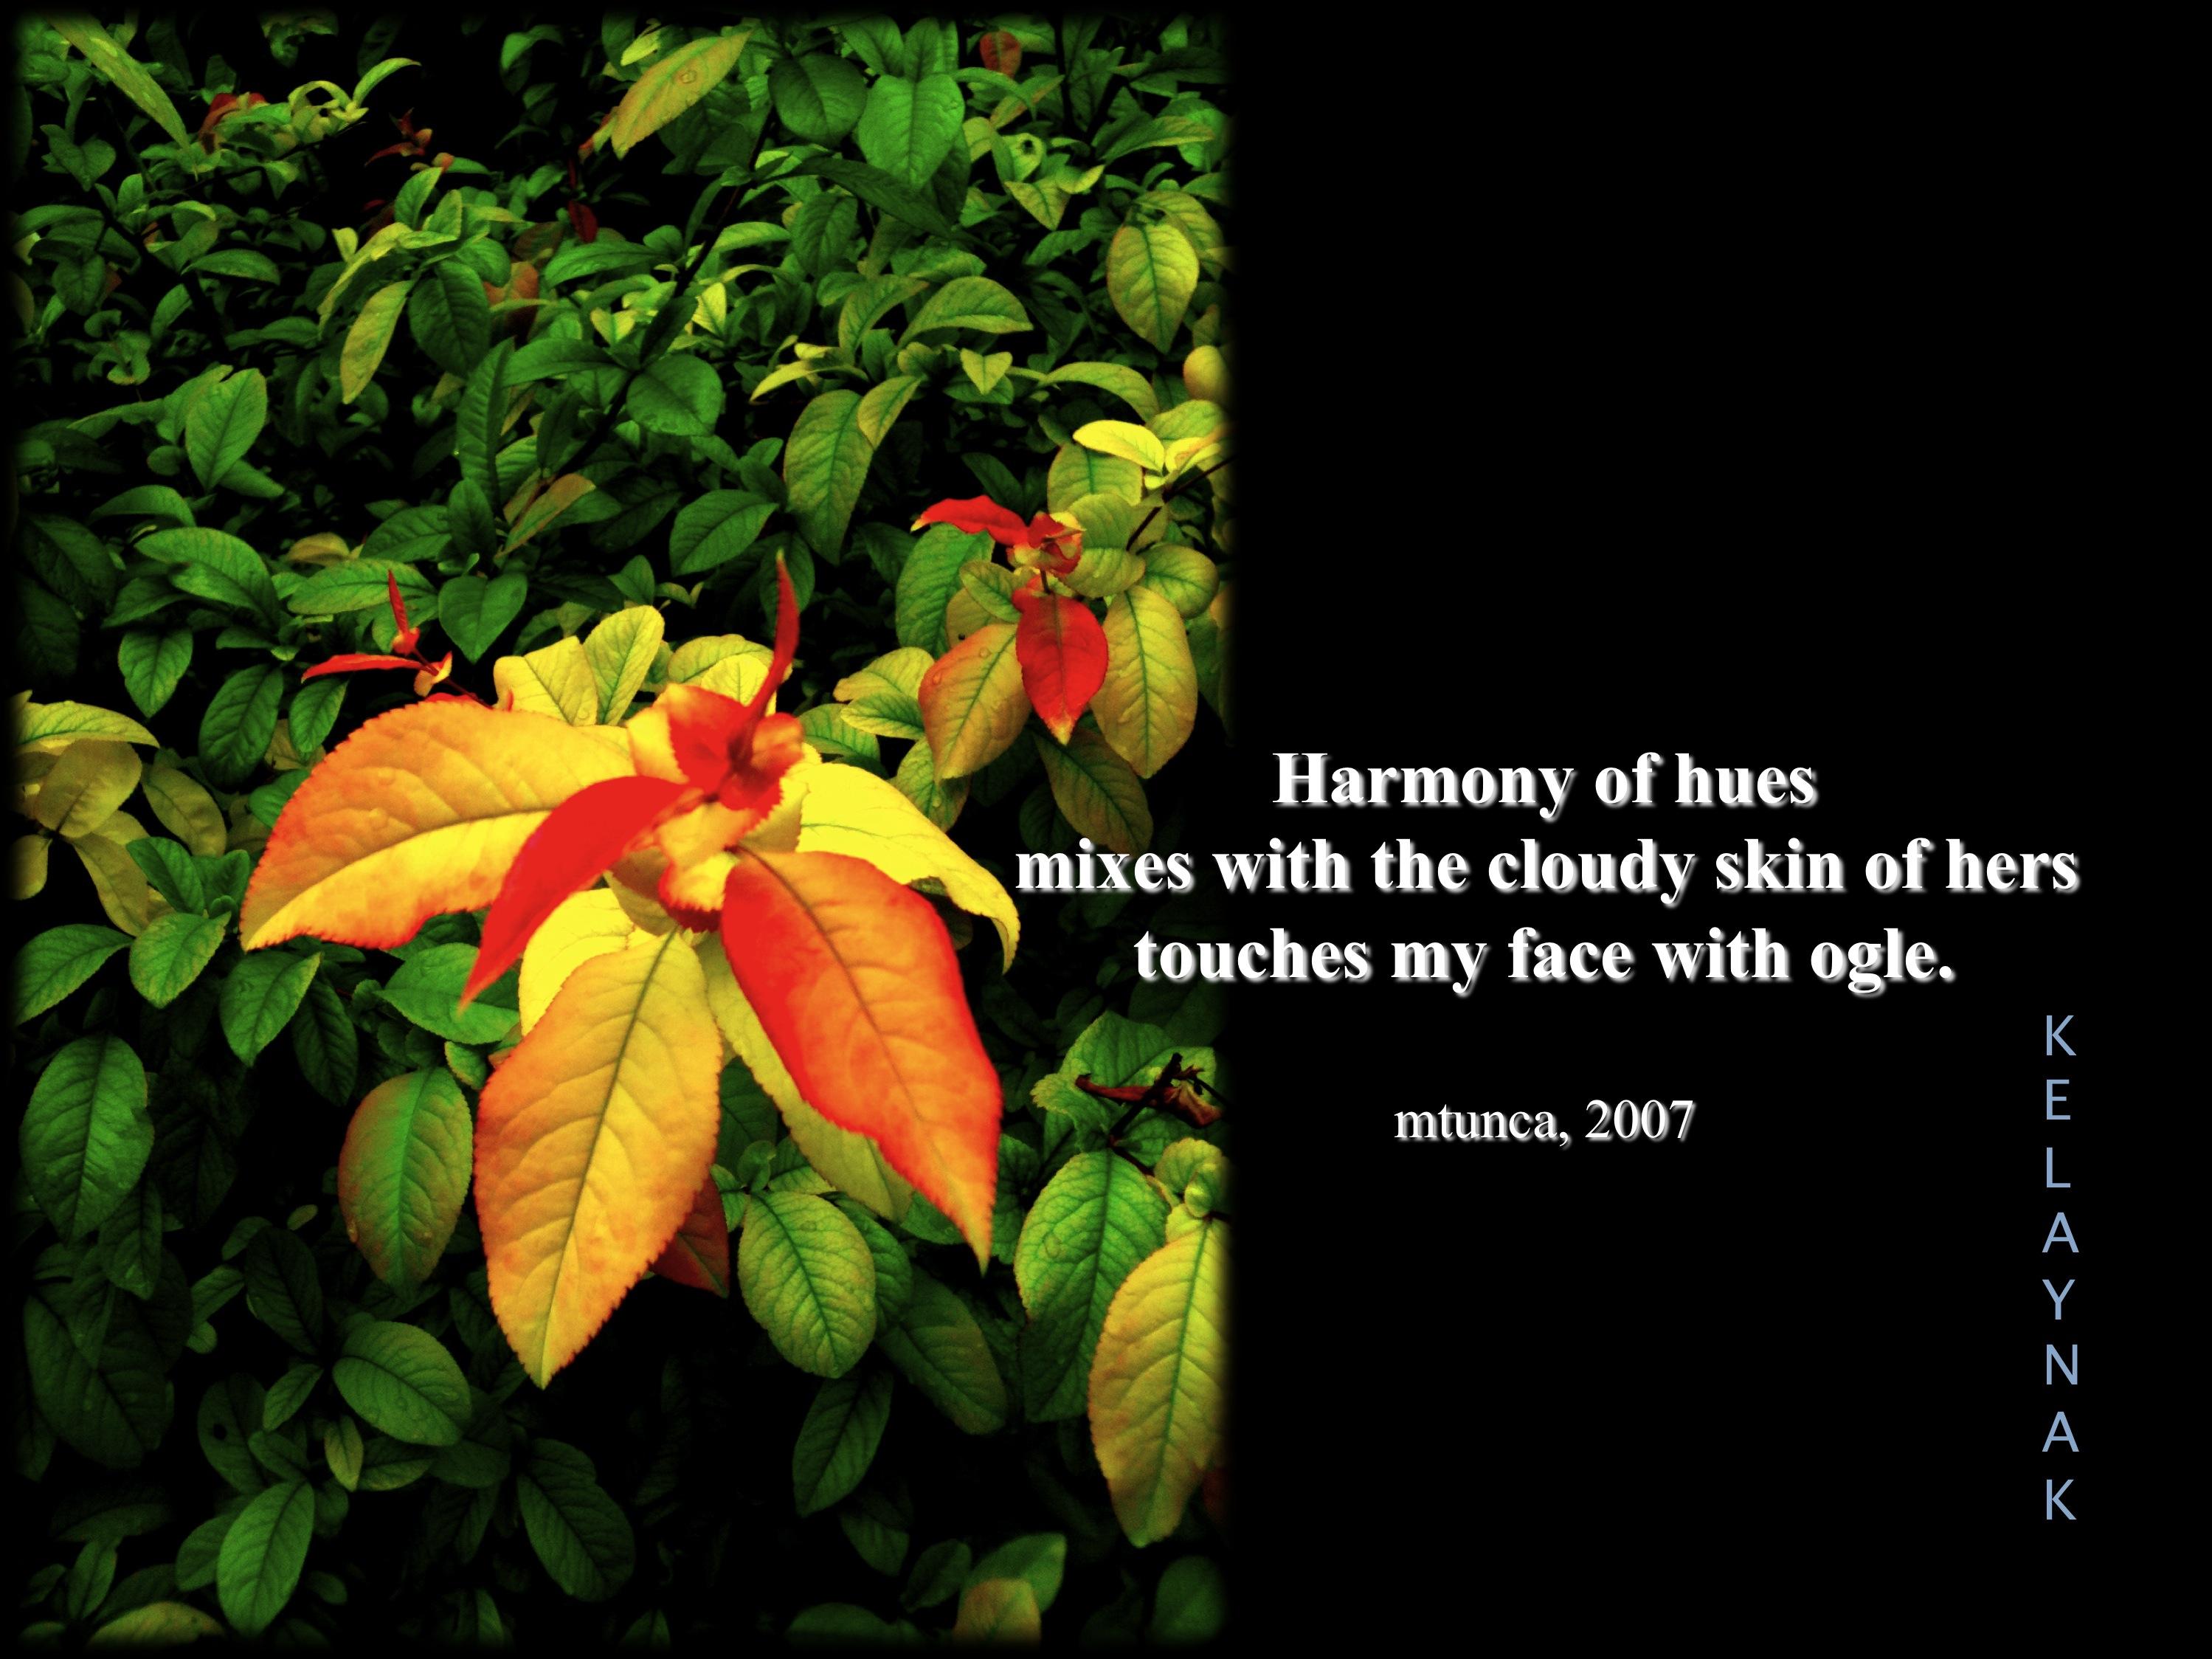 HARMONY OF HUES-RENKLERİN UYUMU